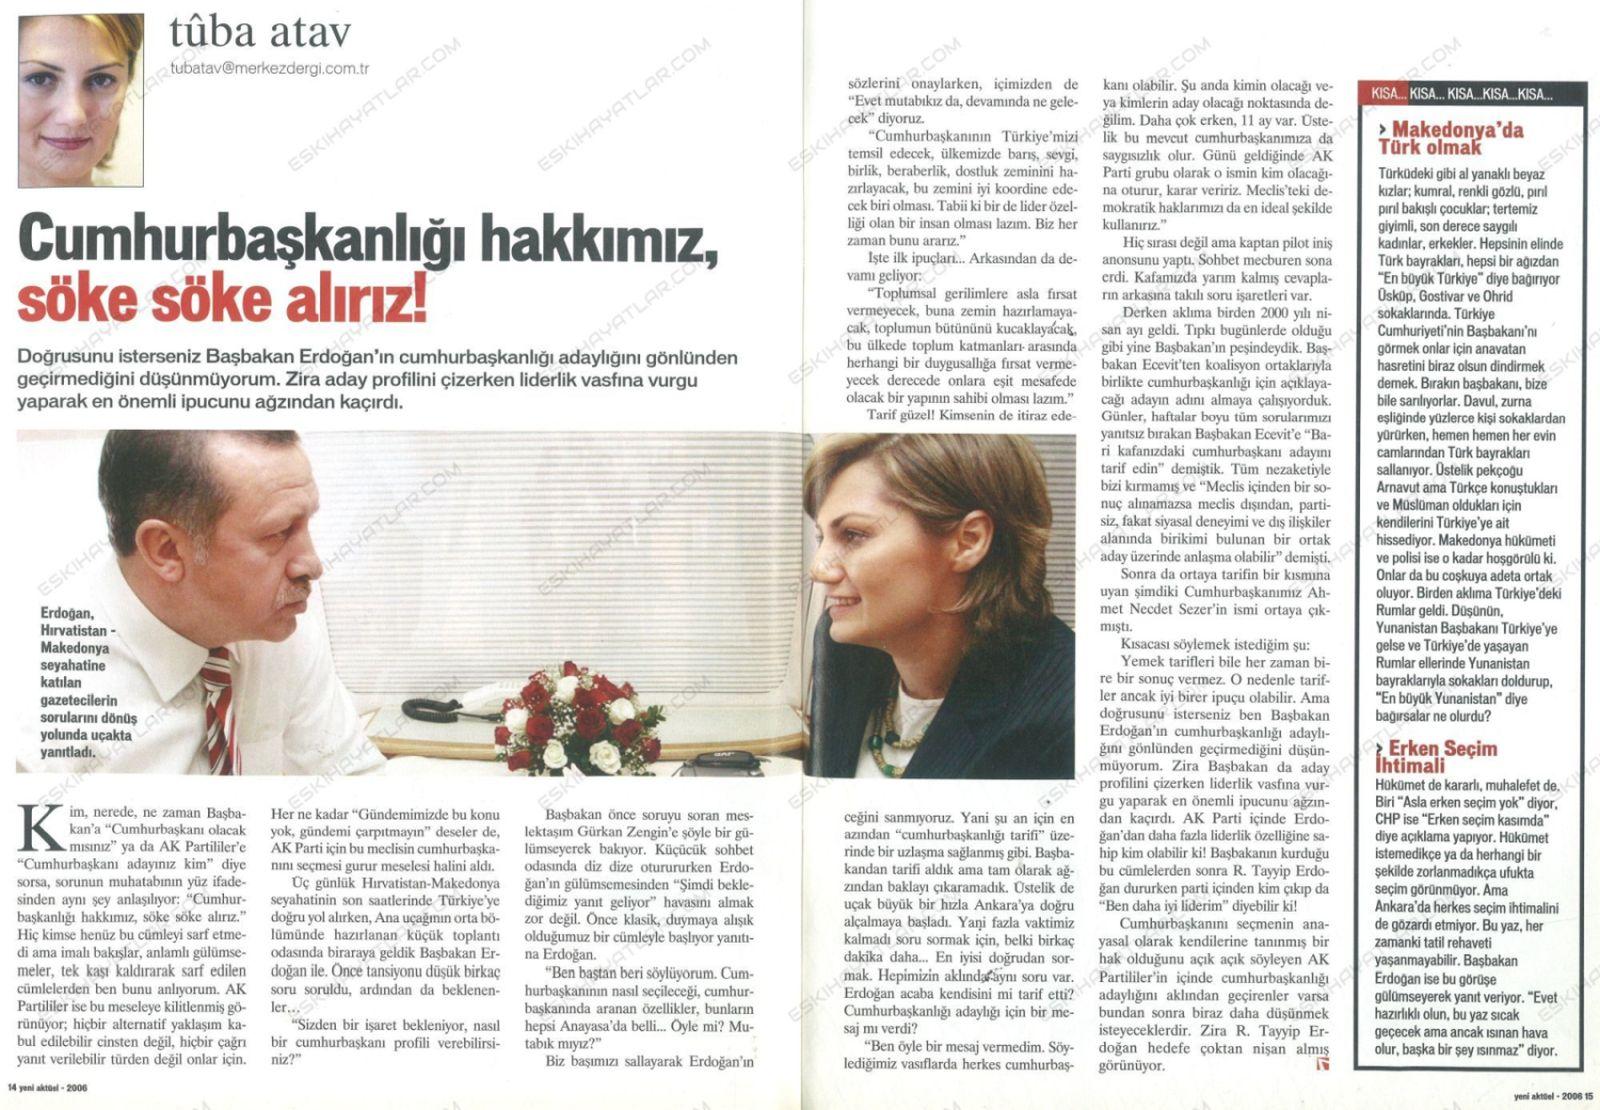 recep-tayyip-erdogan-cumhurbaskanligi-hakkimiz-soke-soke-aliriz-2006-aktuel (1)